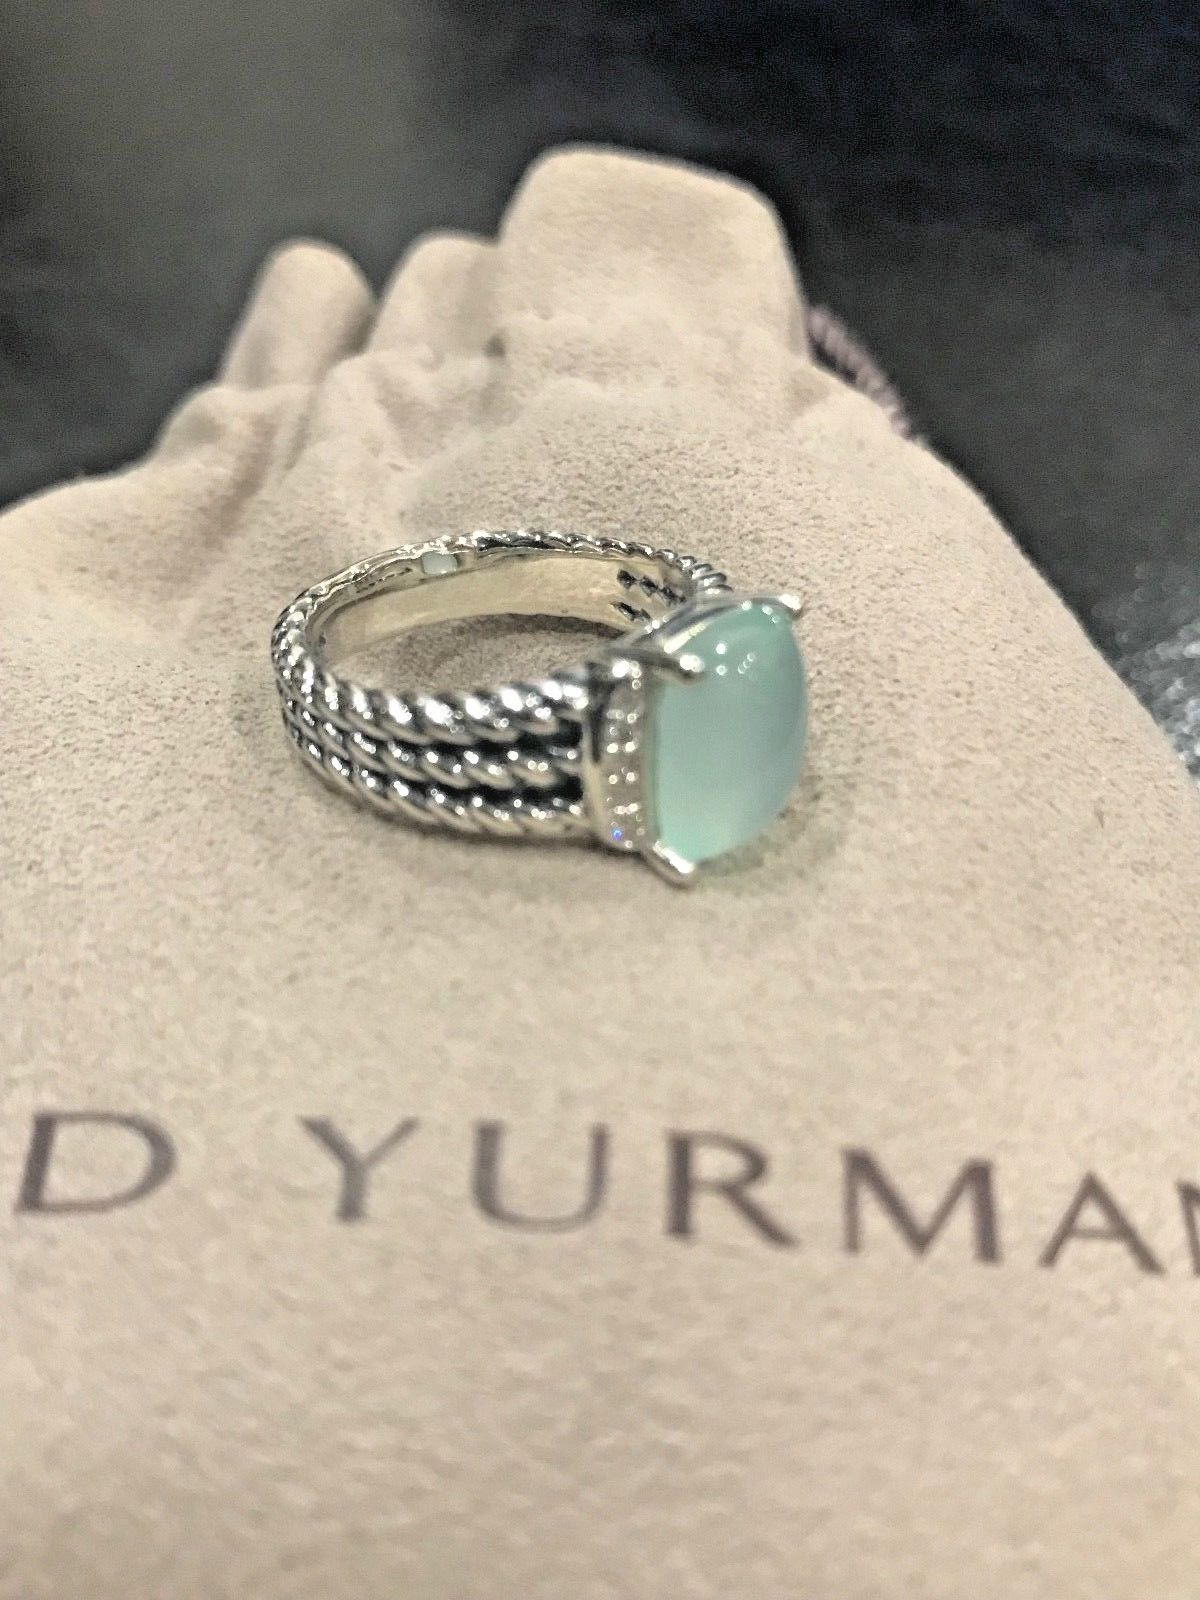 DAVID YURMAN RING PETITE WHEATON AQUA CHALCEDONY AND DIAMOND SIZE - 6